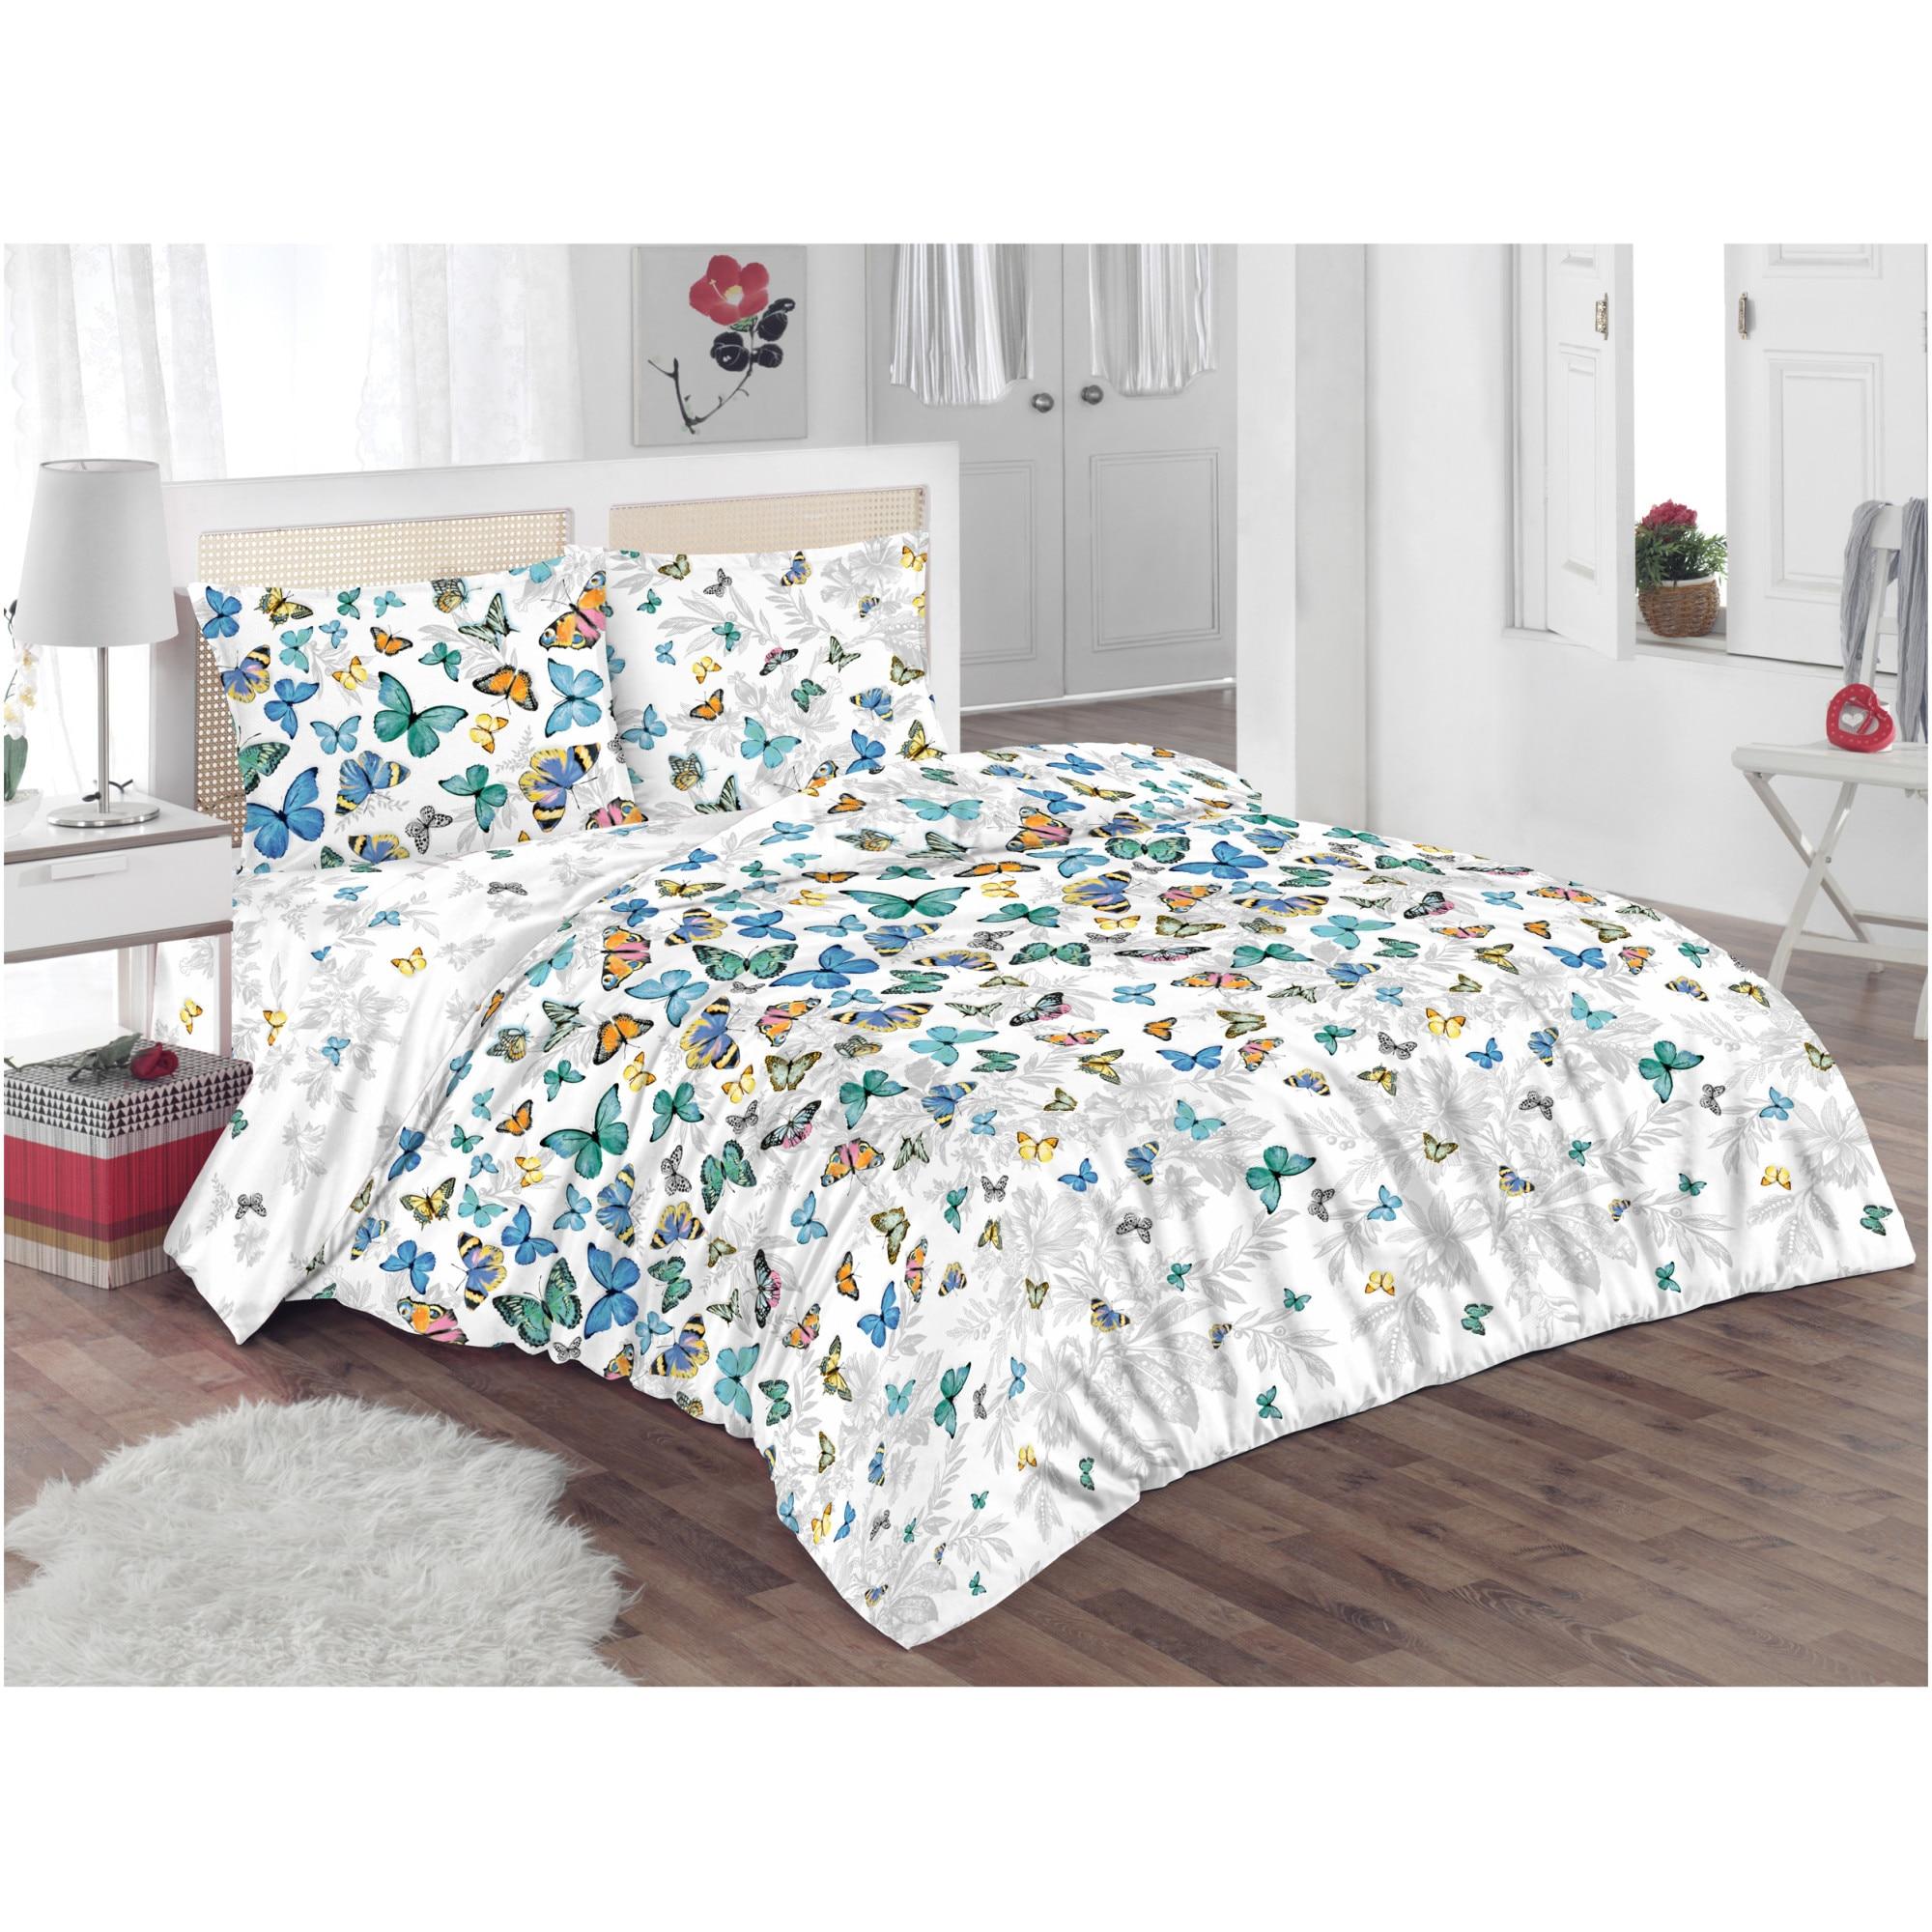 Lenjerie de pat pentru doua persoane Kring Butterflies